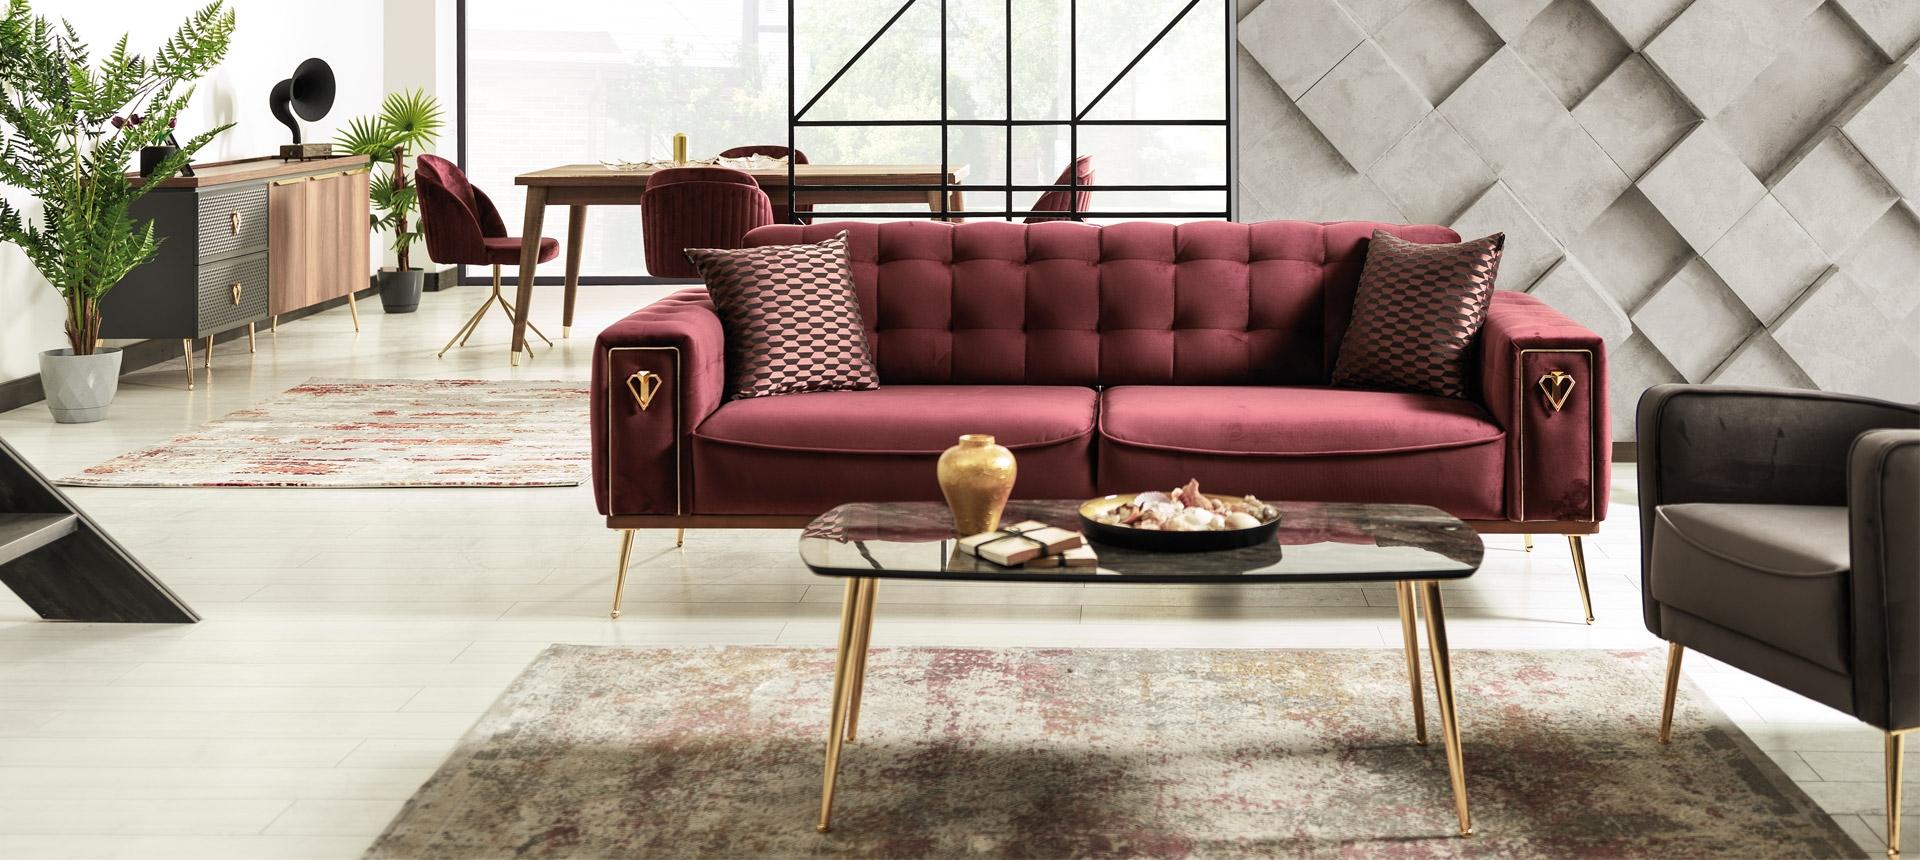 Canapea tapitata cu stofa, 3 locuri, cu functie sleep pentru 1 persoana Pietro Burgundy K1, l226xA95xH84 cm